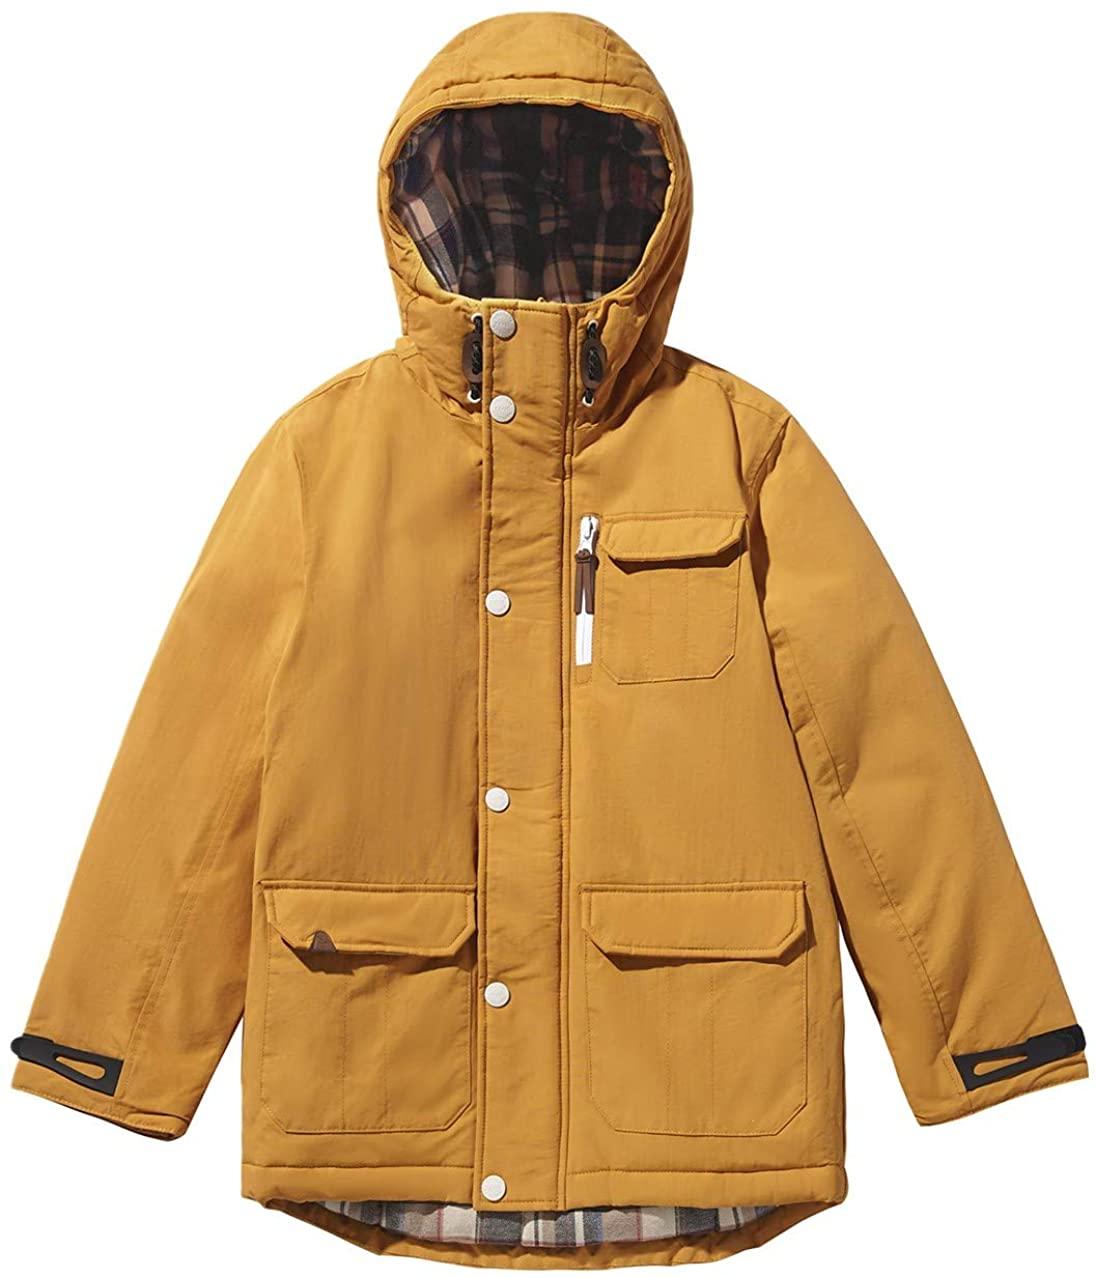 SOLOCOTE Boys Coats Kids Winter Jacket Warm Thick Heavyweight Tough Long Windproof Outwear with Hood